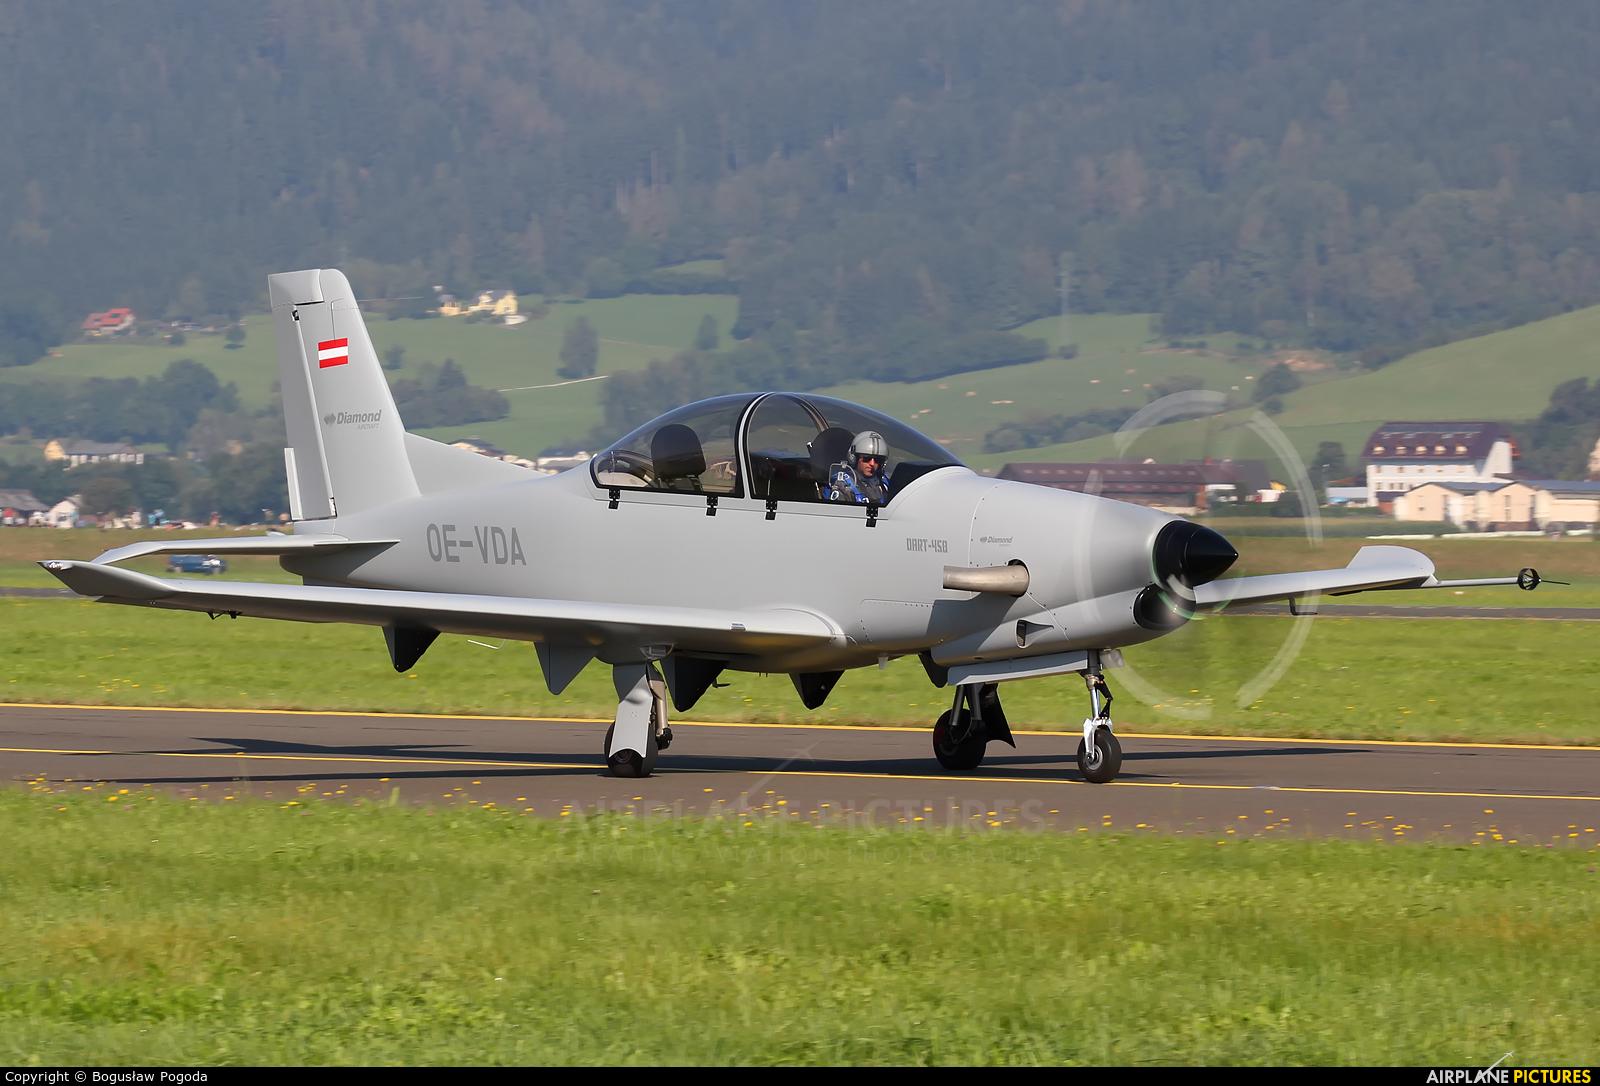 Private OE-VDA aircraft at Zeltweg